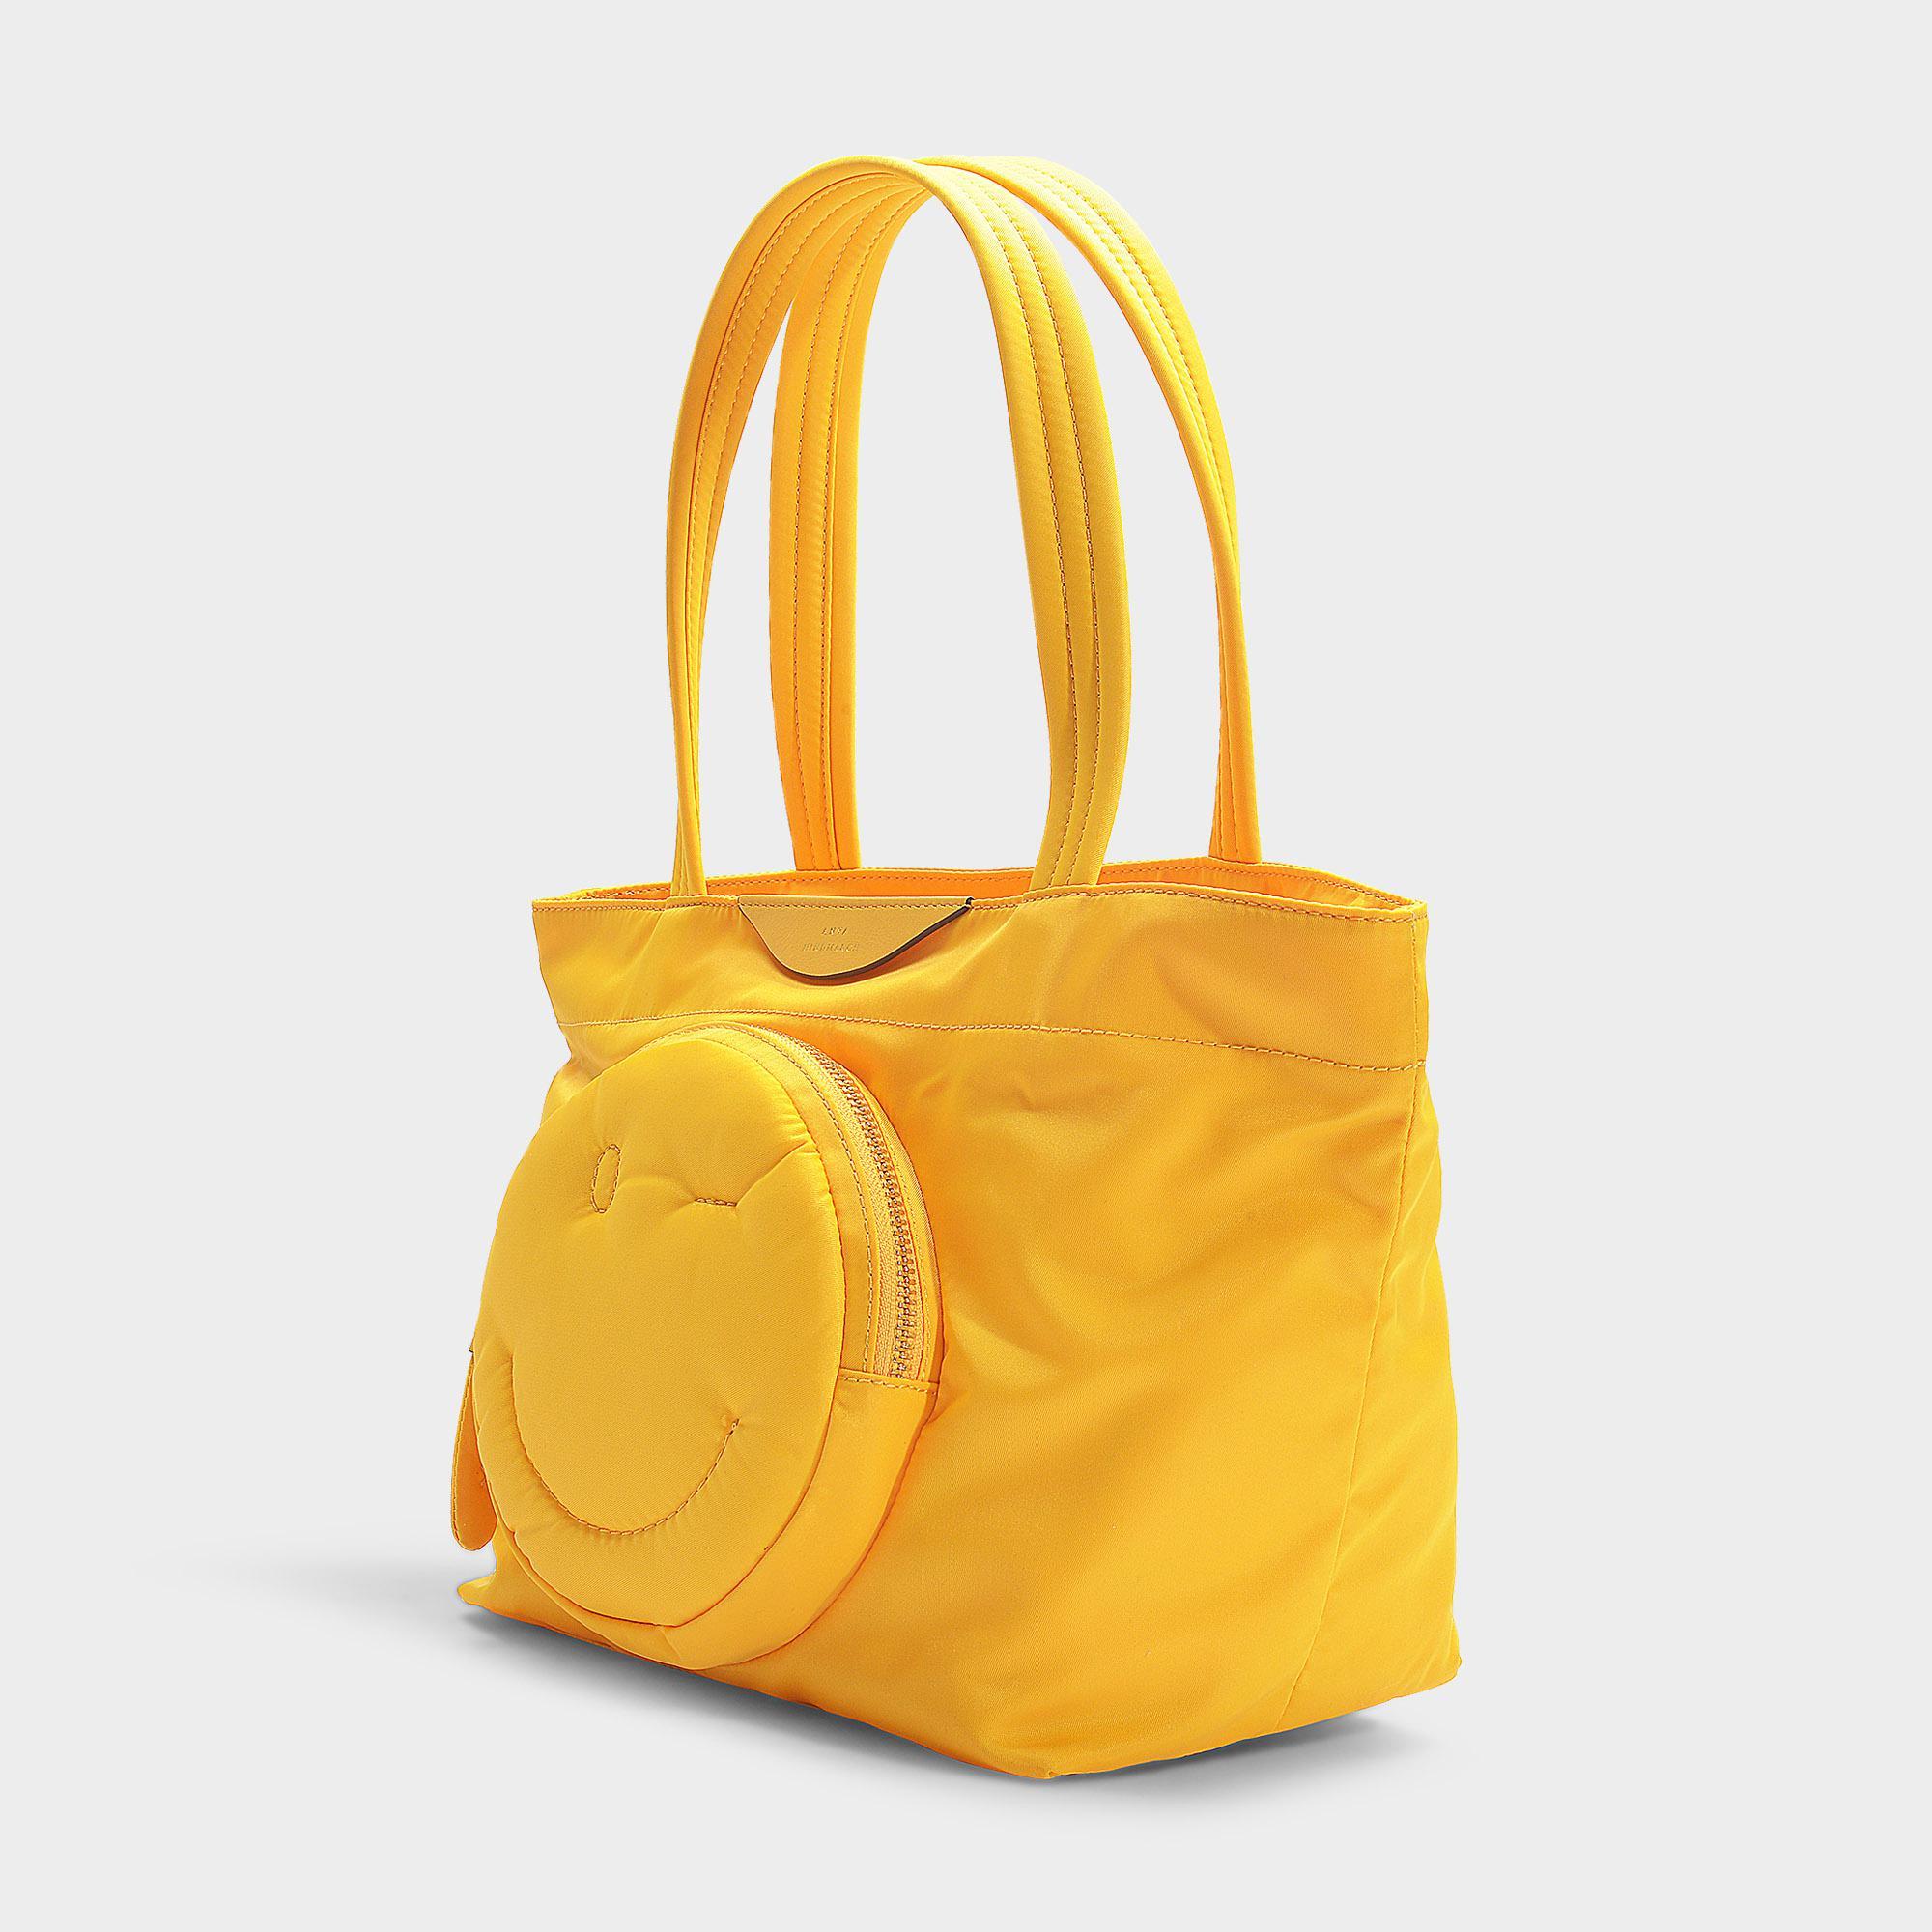 4ec88b6832a anya-hindmarch-Yellow-Chubby-Wink-Mini-Tote-In-Yellow-Nylon.jpeg